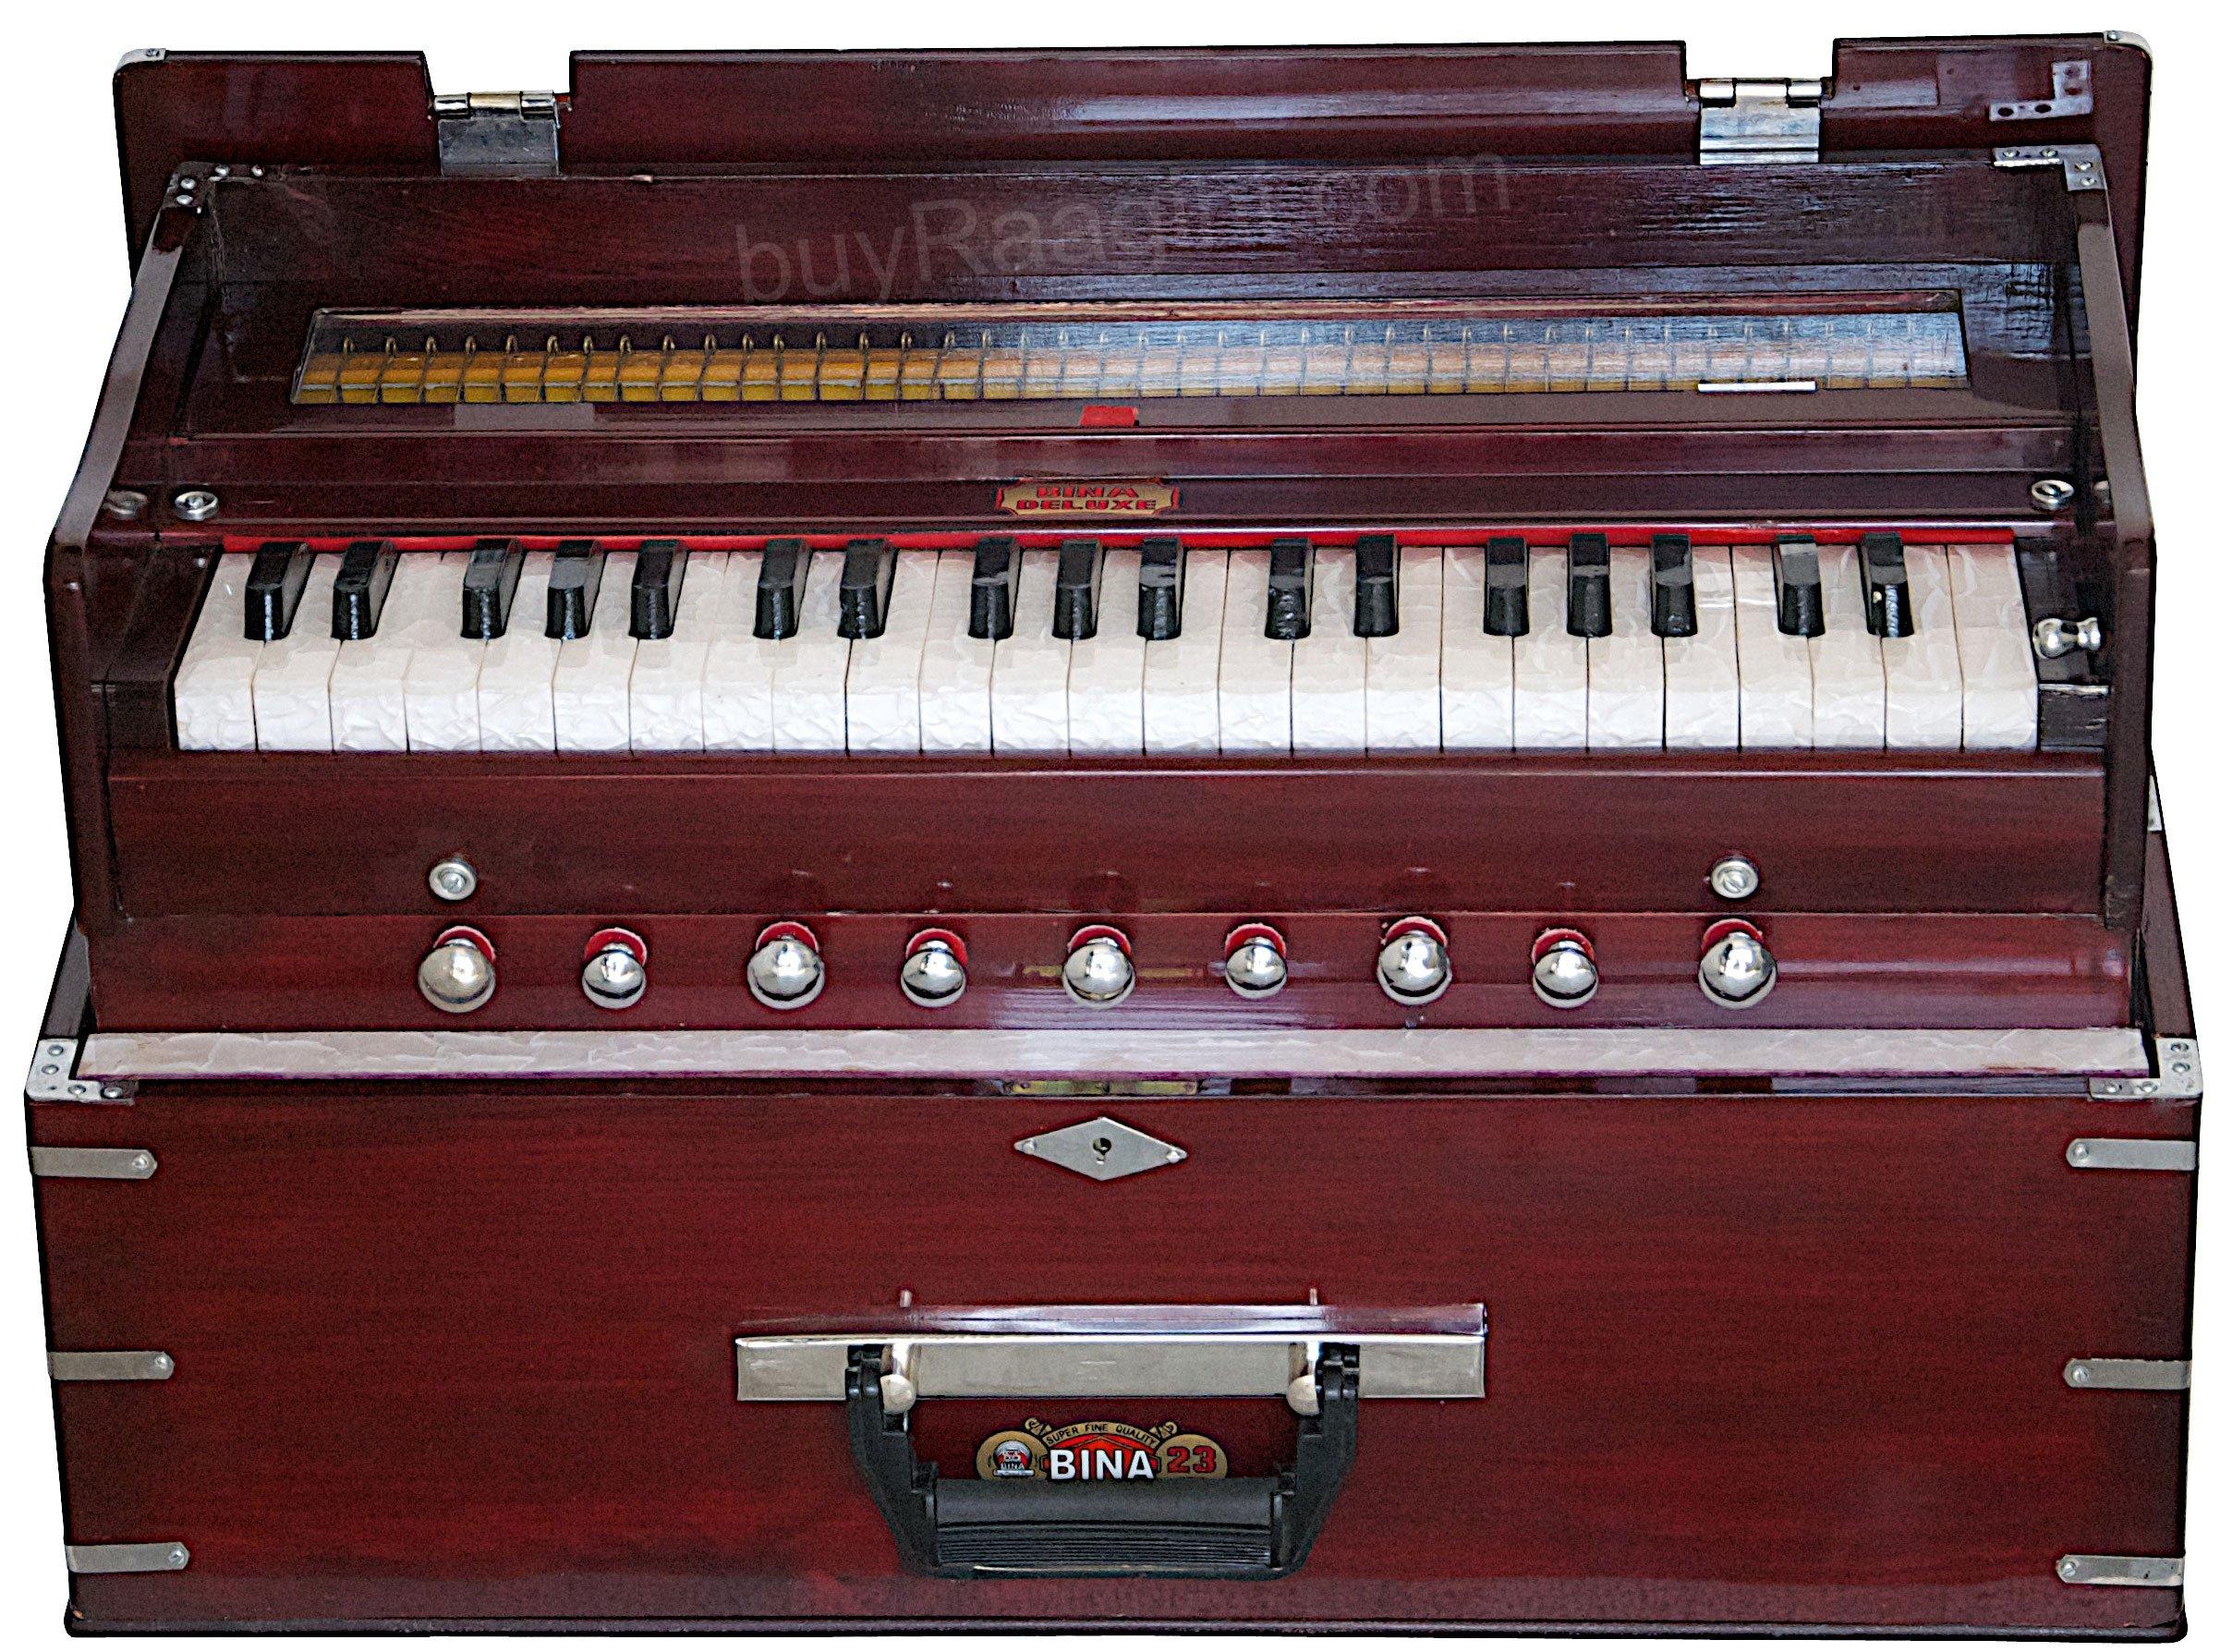 Harmonium BINA 23B, USA, Professional, Folding, Safri, 3 1/2 Octaves, 9 Stops, Rosewood Color, Coupler, Double Reed, Nylon Bag, Book, Indian Musical Instrument, Kirtan (PDI-AGH) by Bina